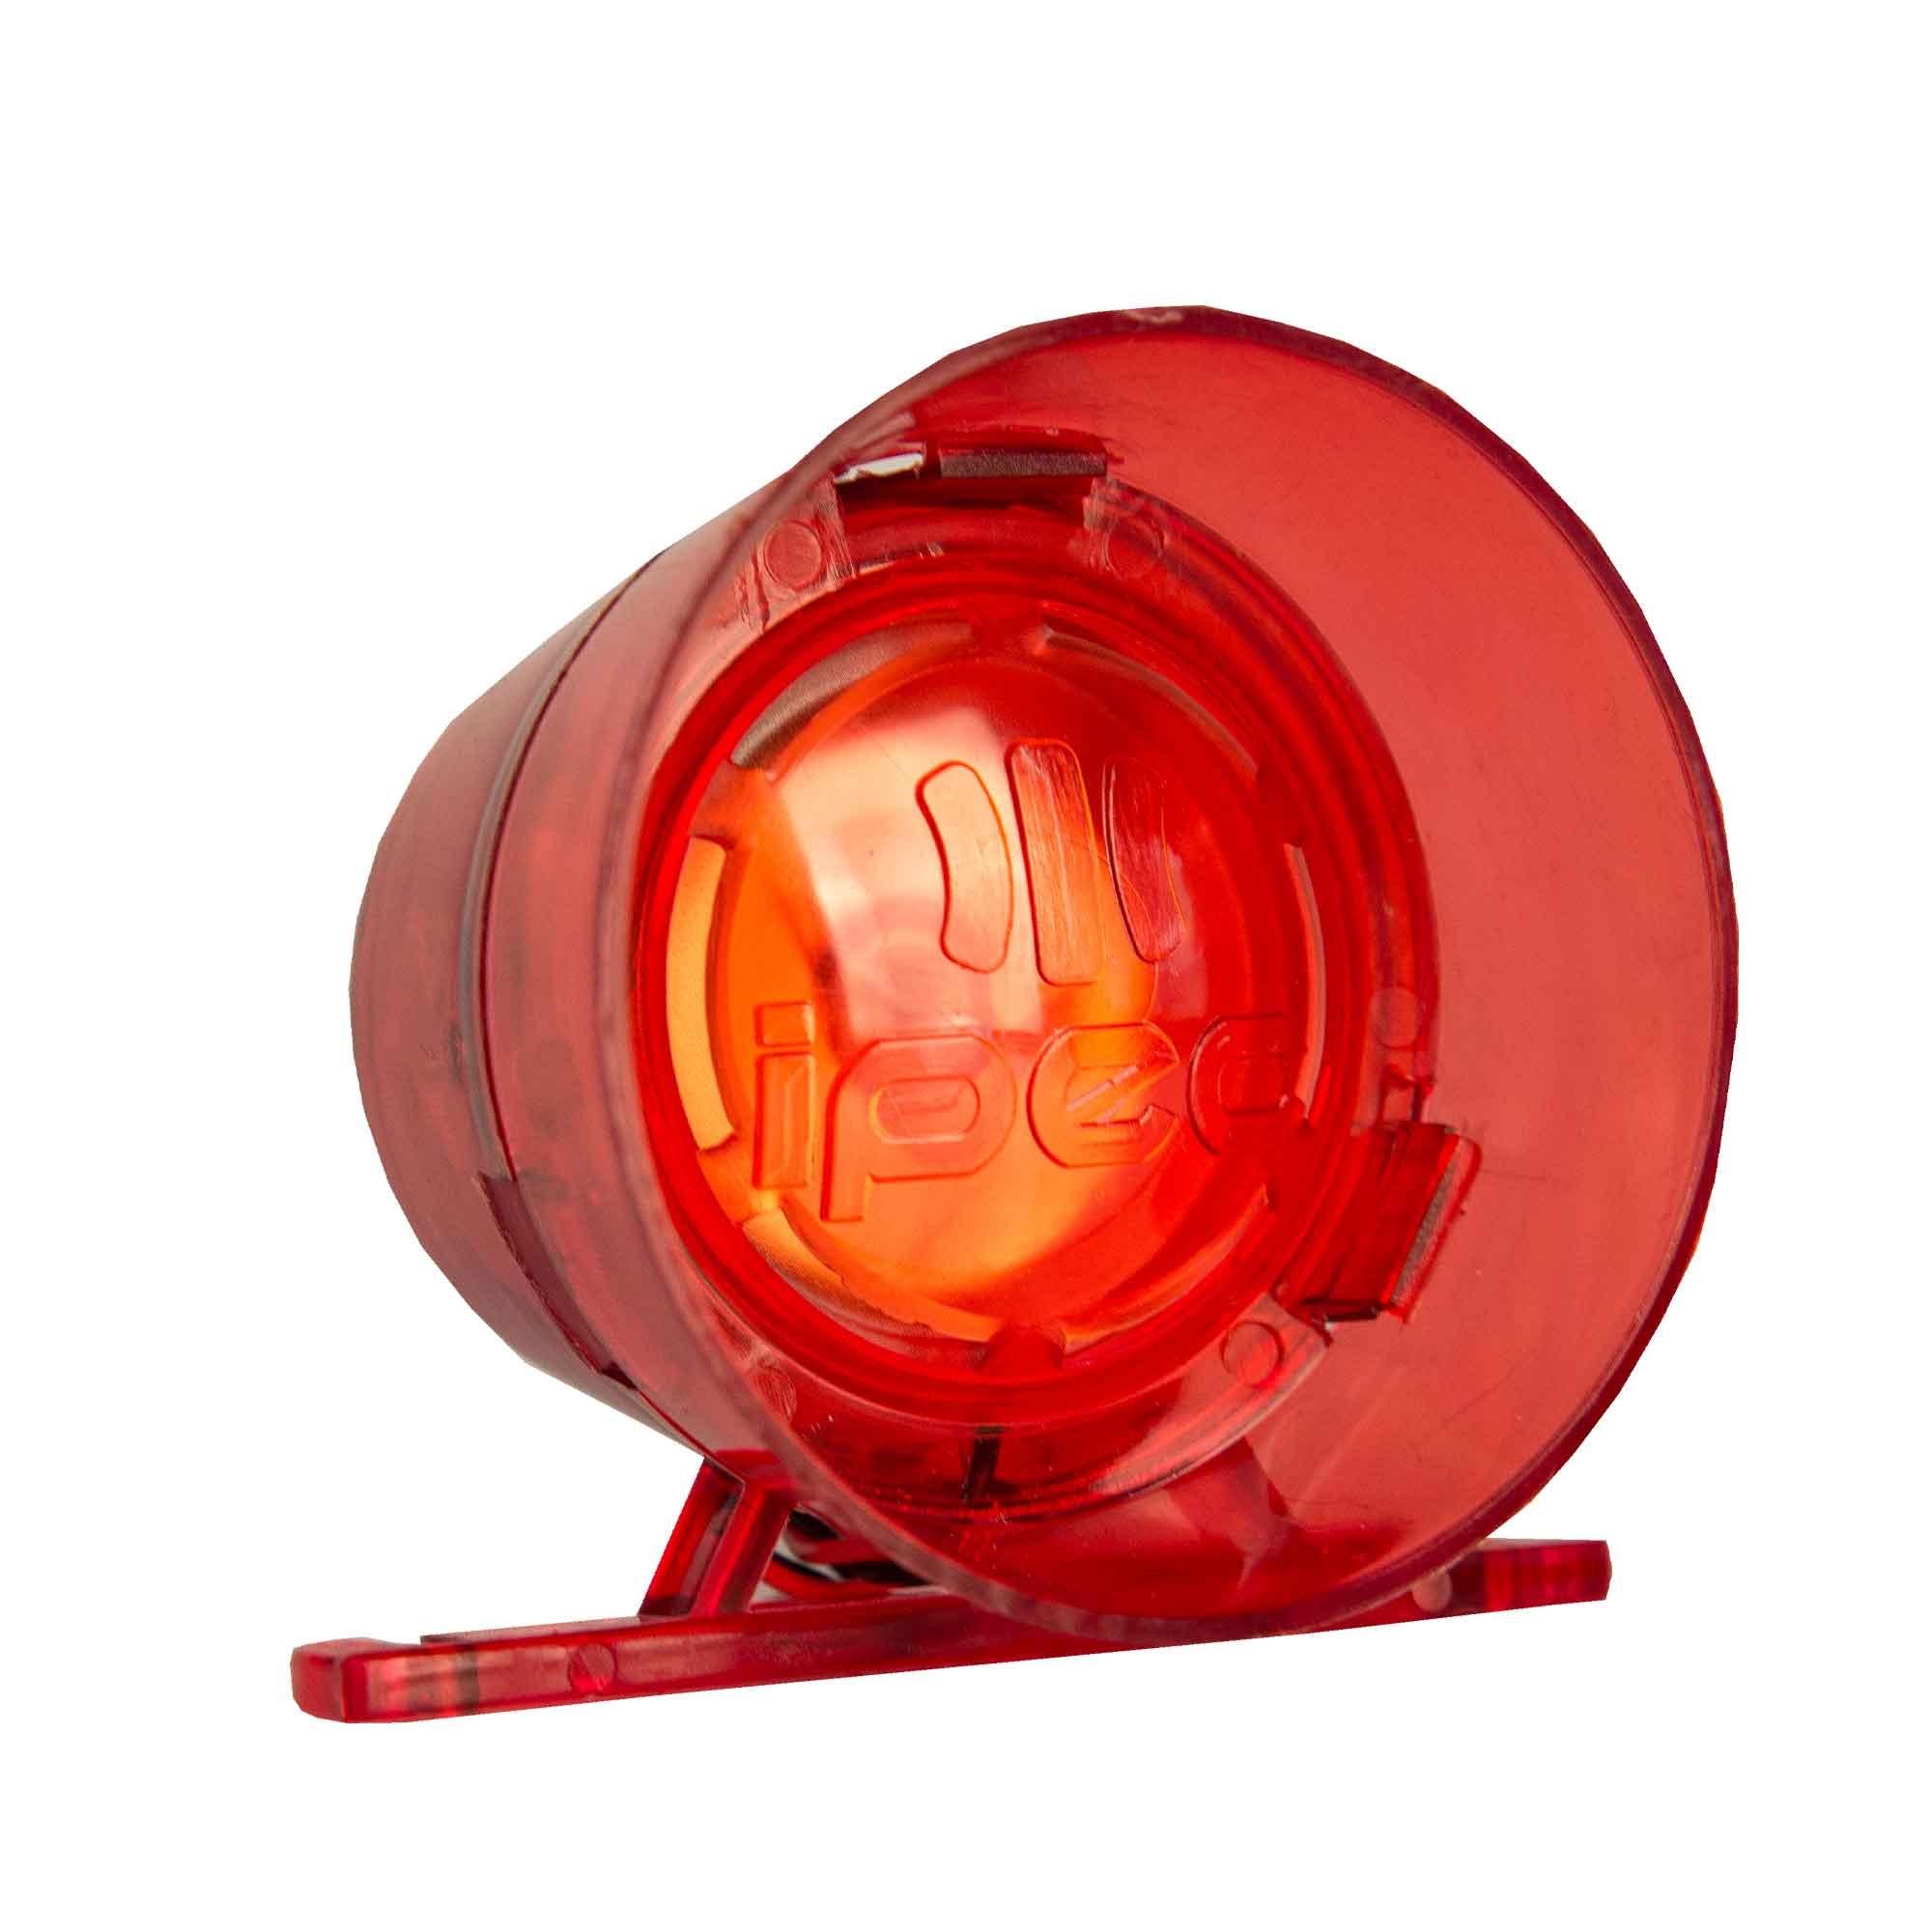 Sirene para Alarme Audiovisual IPEC 12/24 Vdc 120 dB